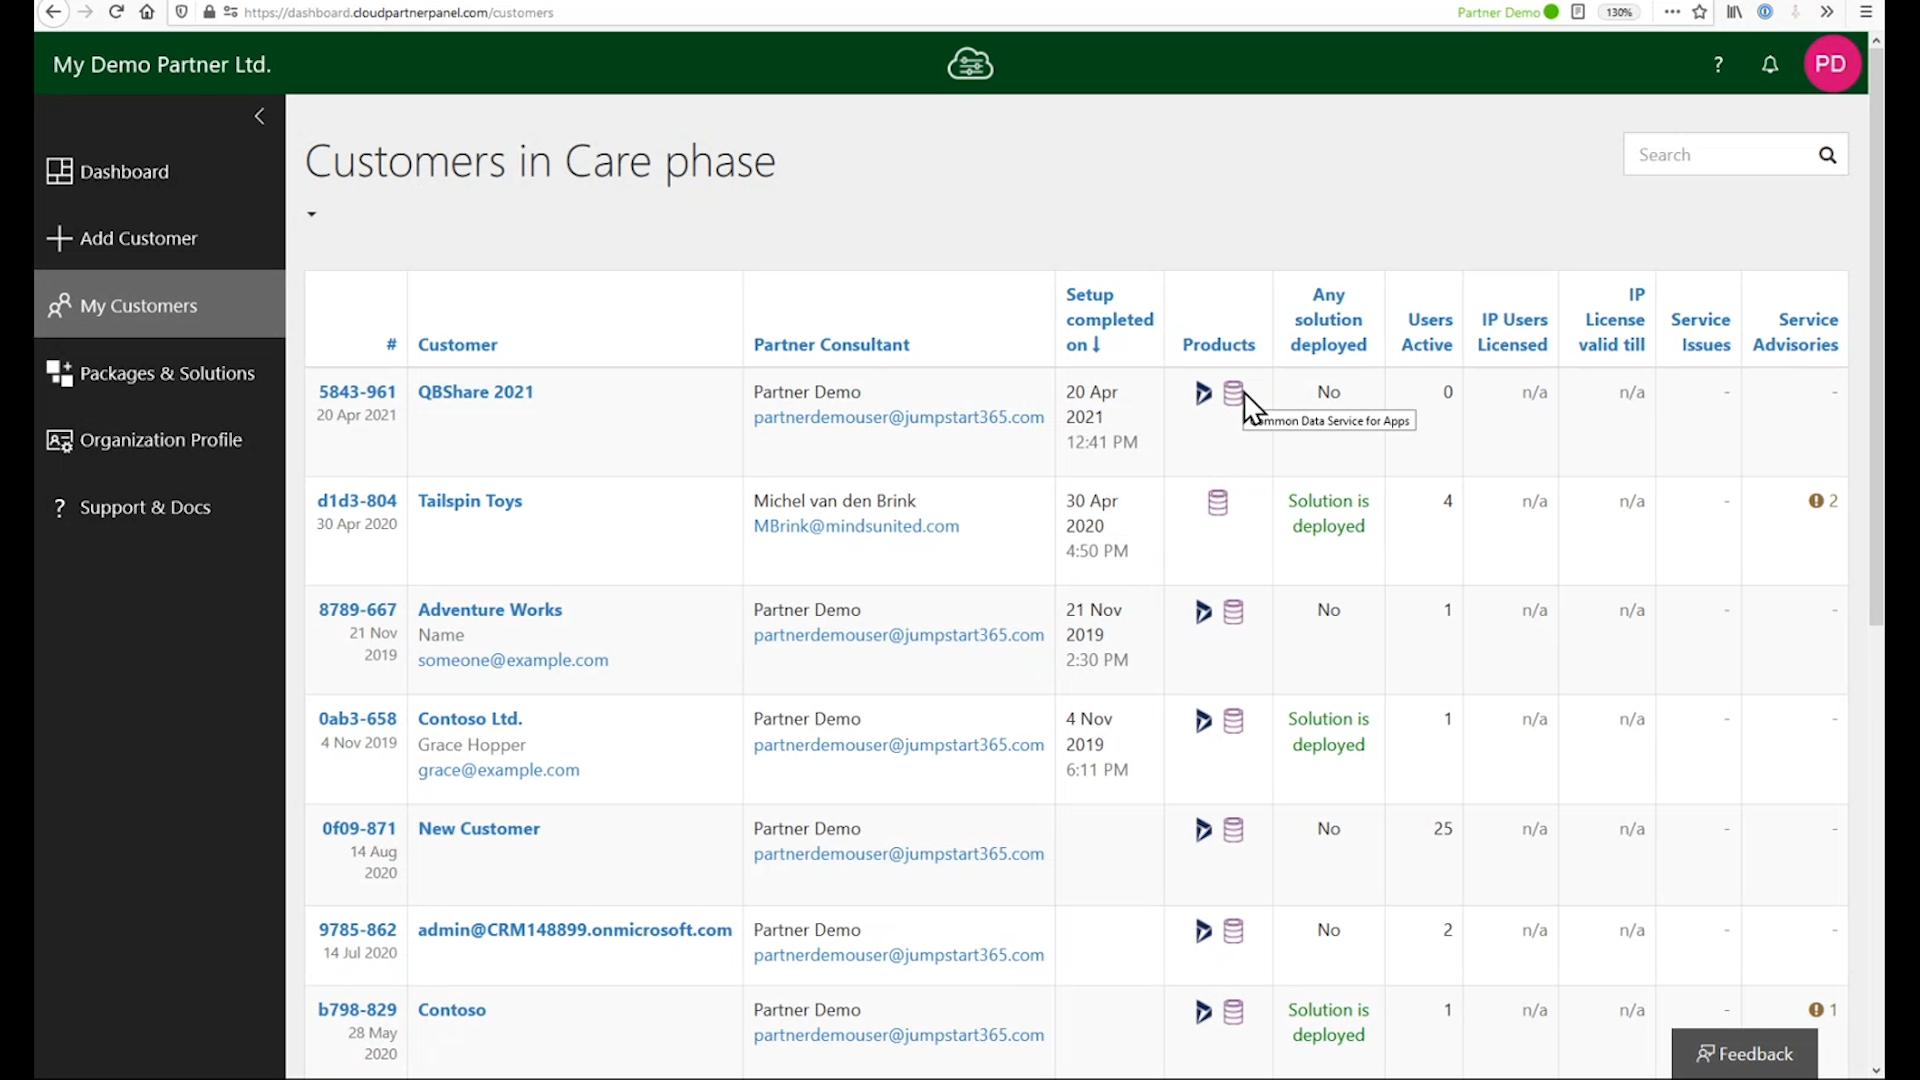 Cloud Partner Panel – Partner management software voor Microsoft Dynamics 365 en Power Apps - Update